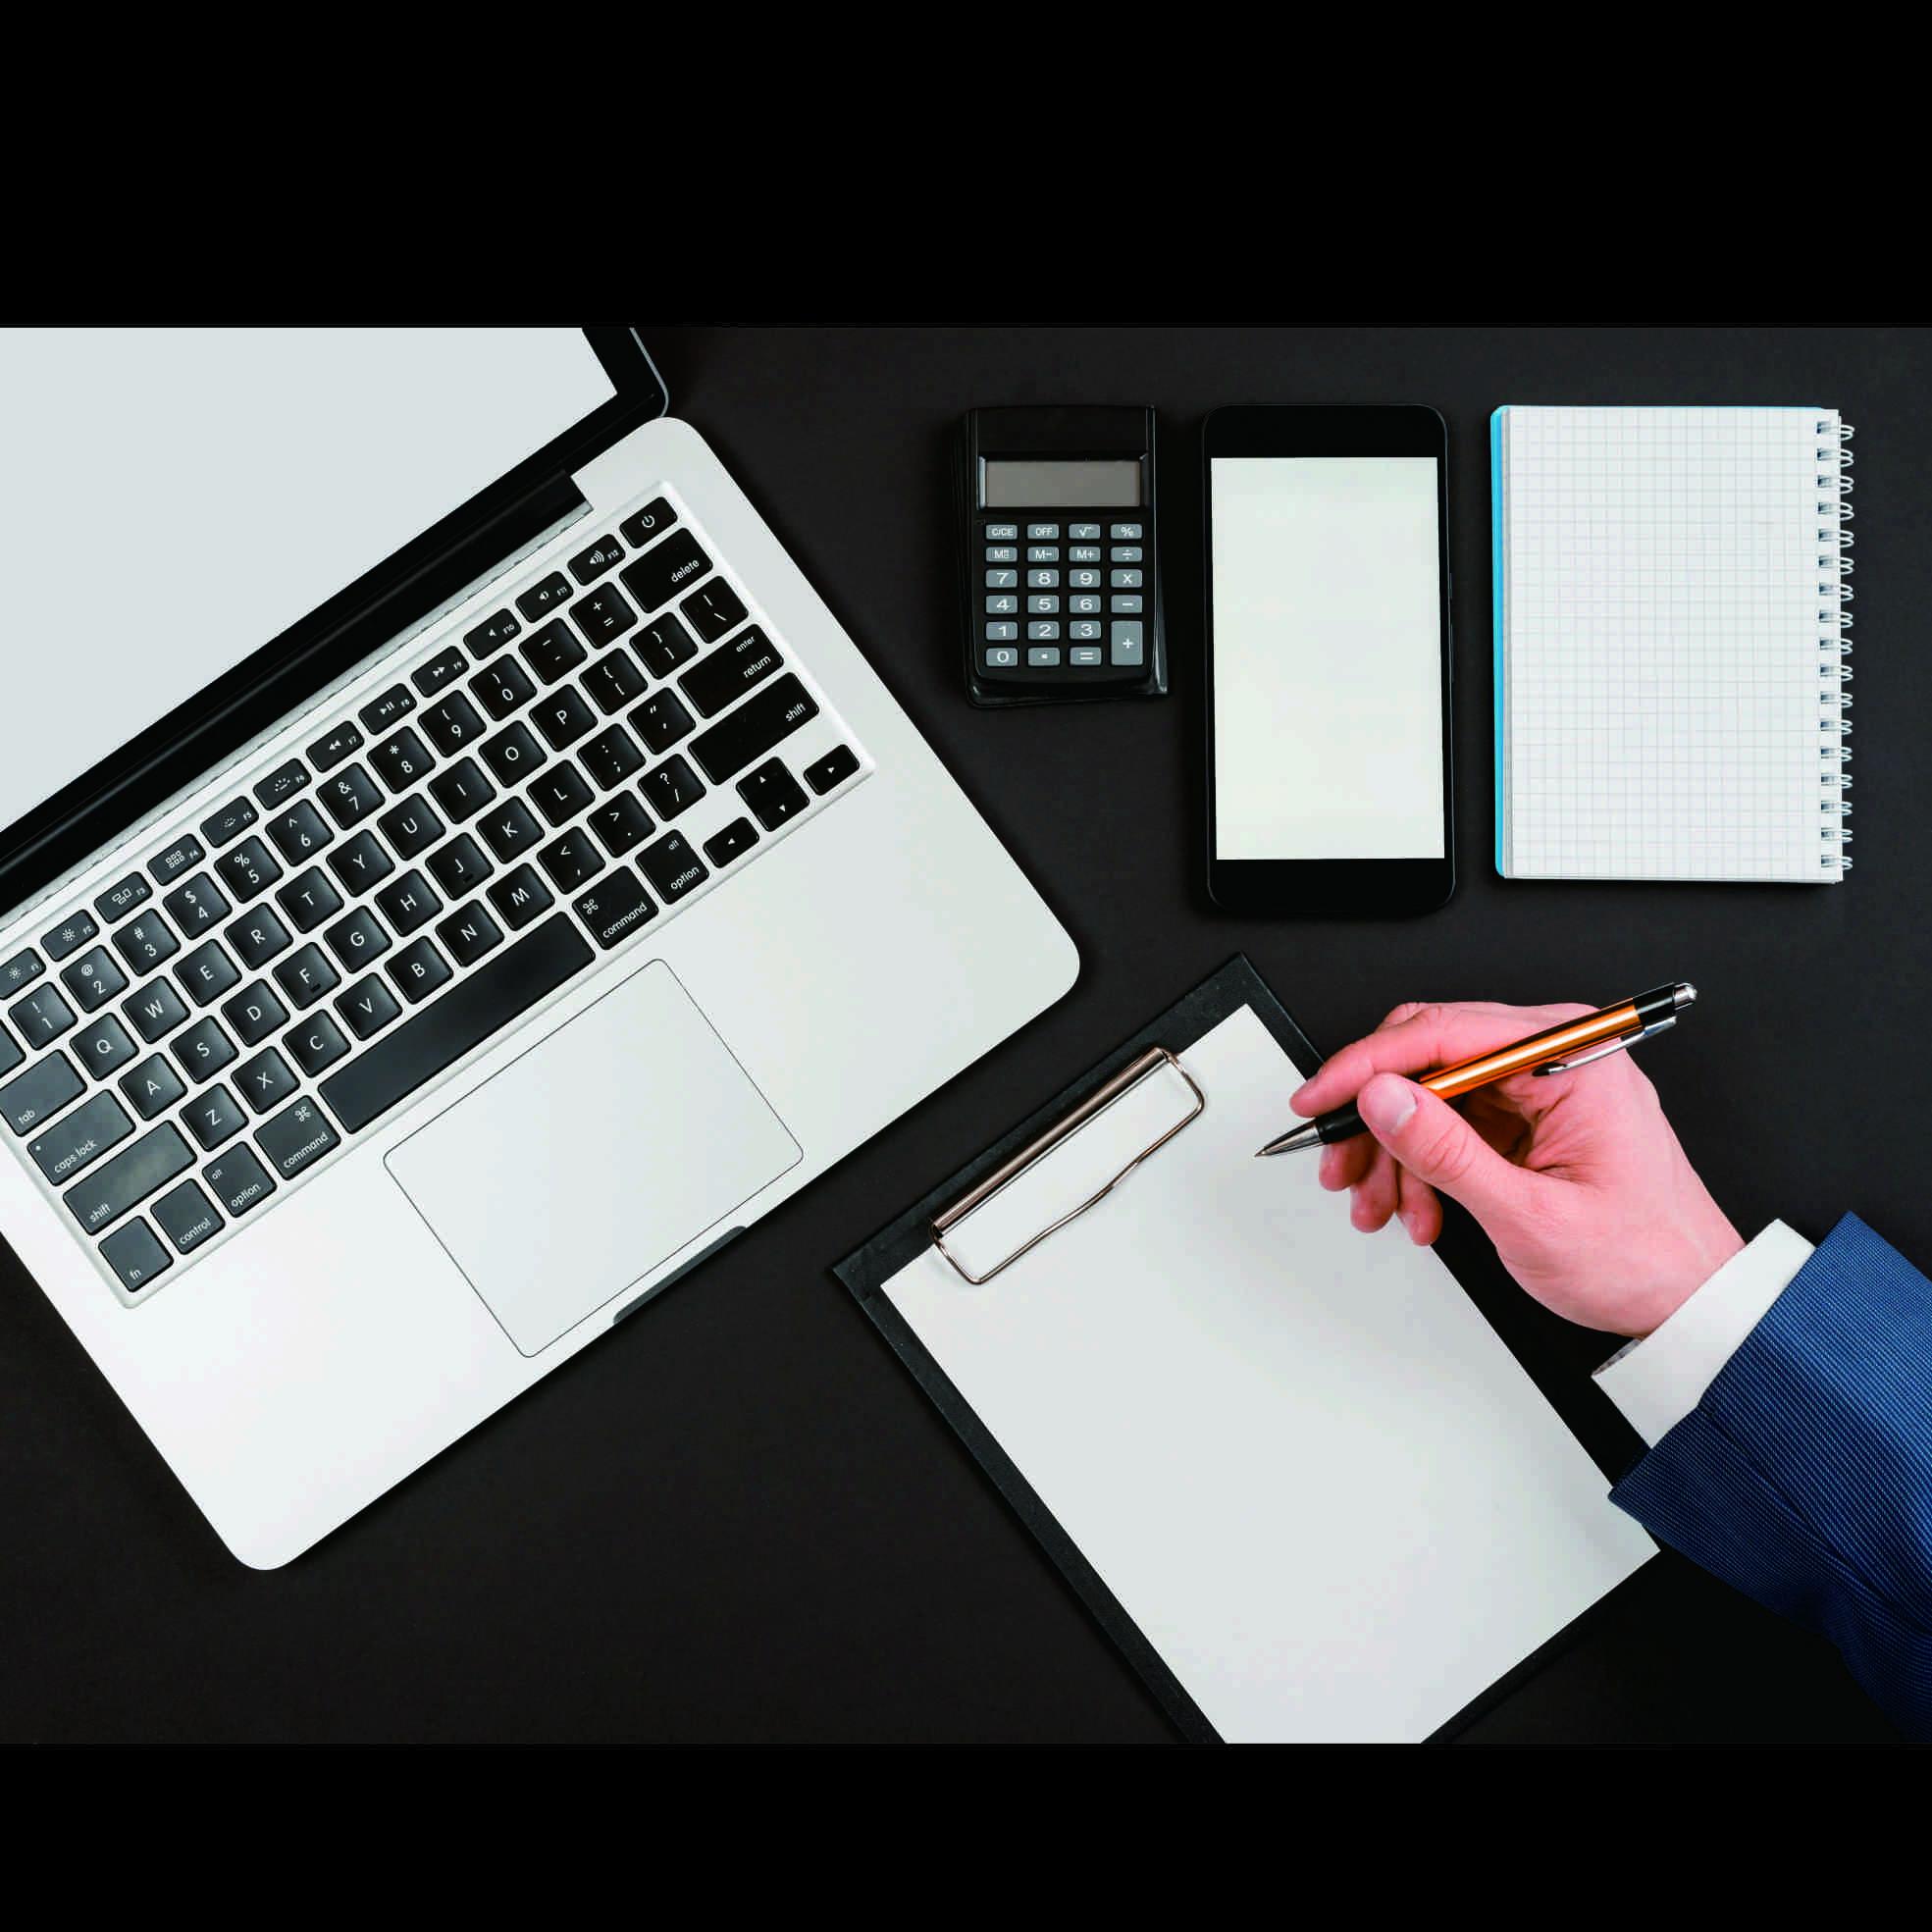 Teknik Pemberkasan Dan Penulisan Laporan Hasil Audit Investigasi Yang Efektif Agustus Lpfa